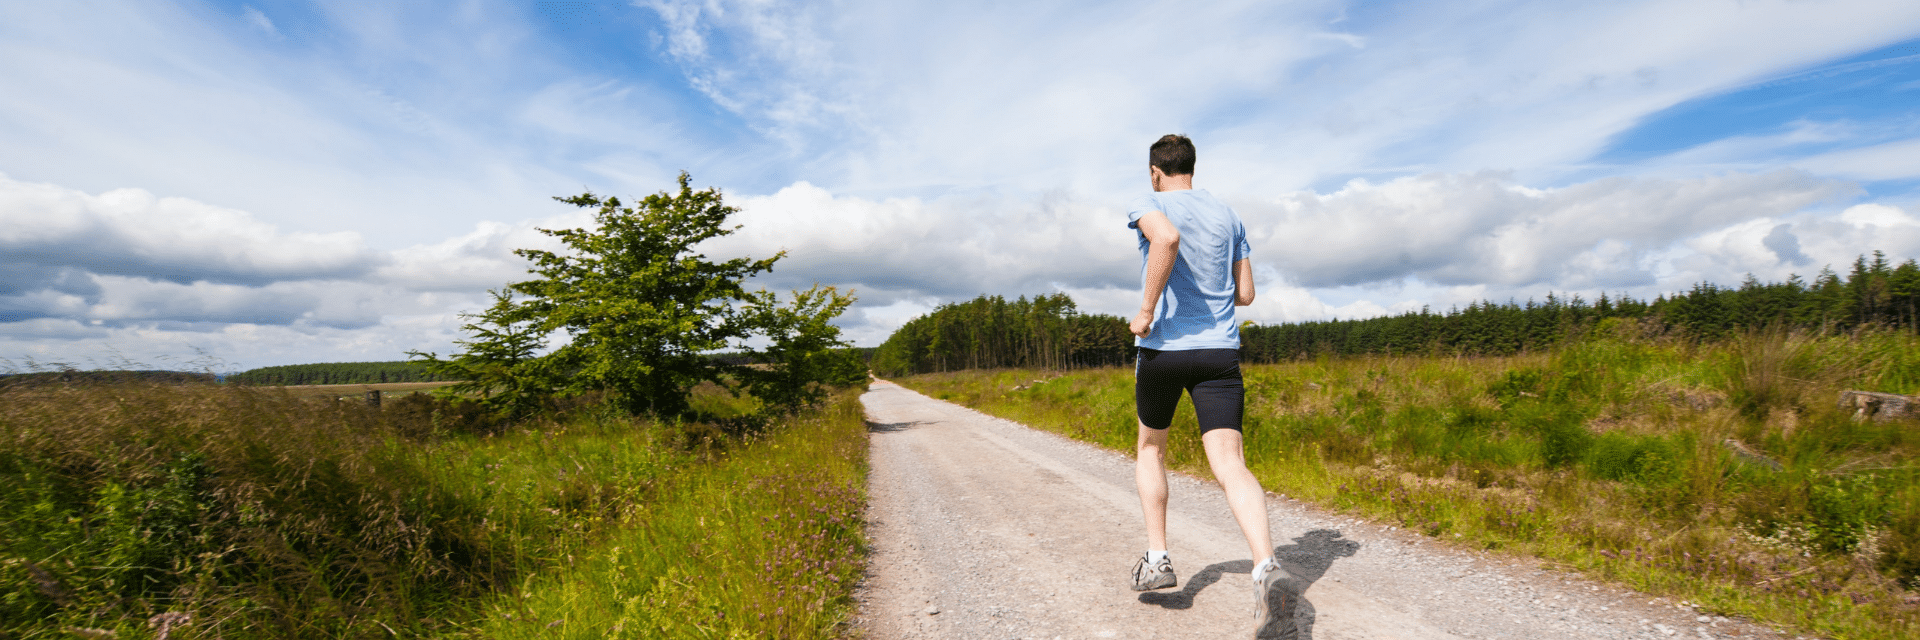 Man jogging as a representation of work life balance